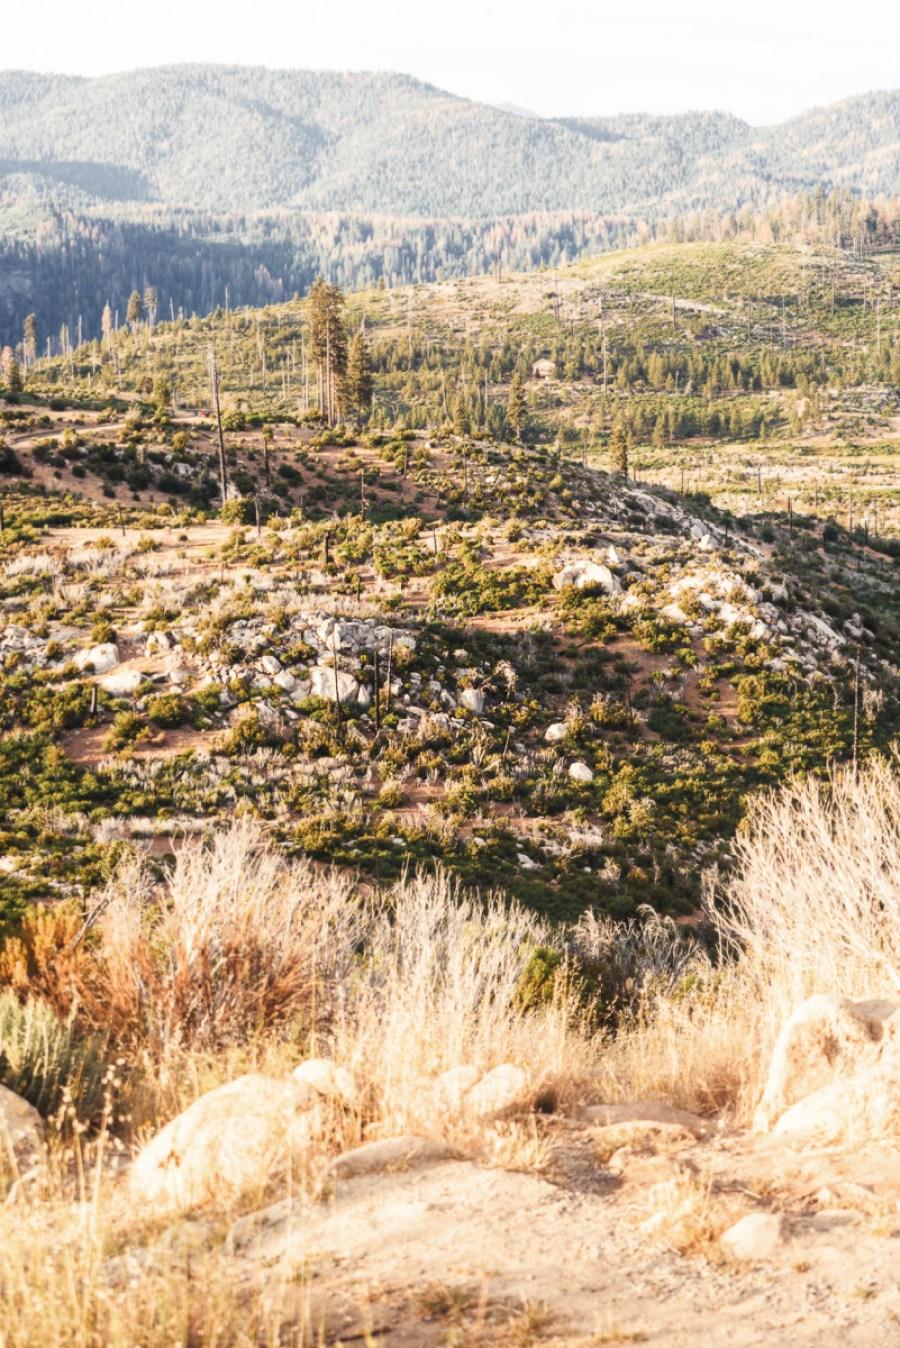 yosemite-national-park-california-u-s-holiday-11